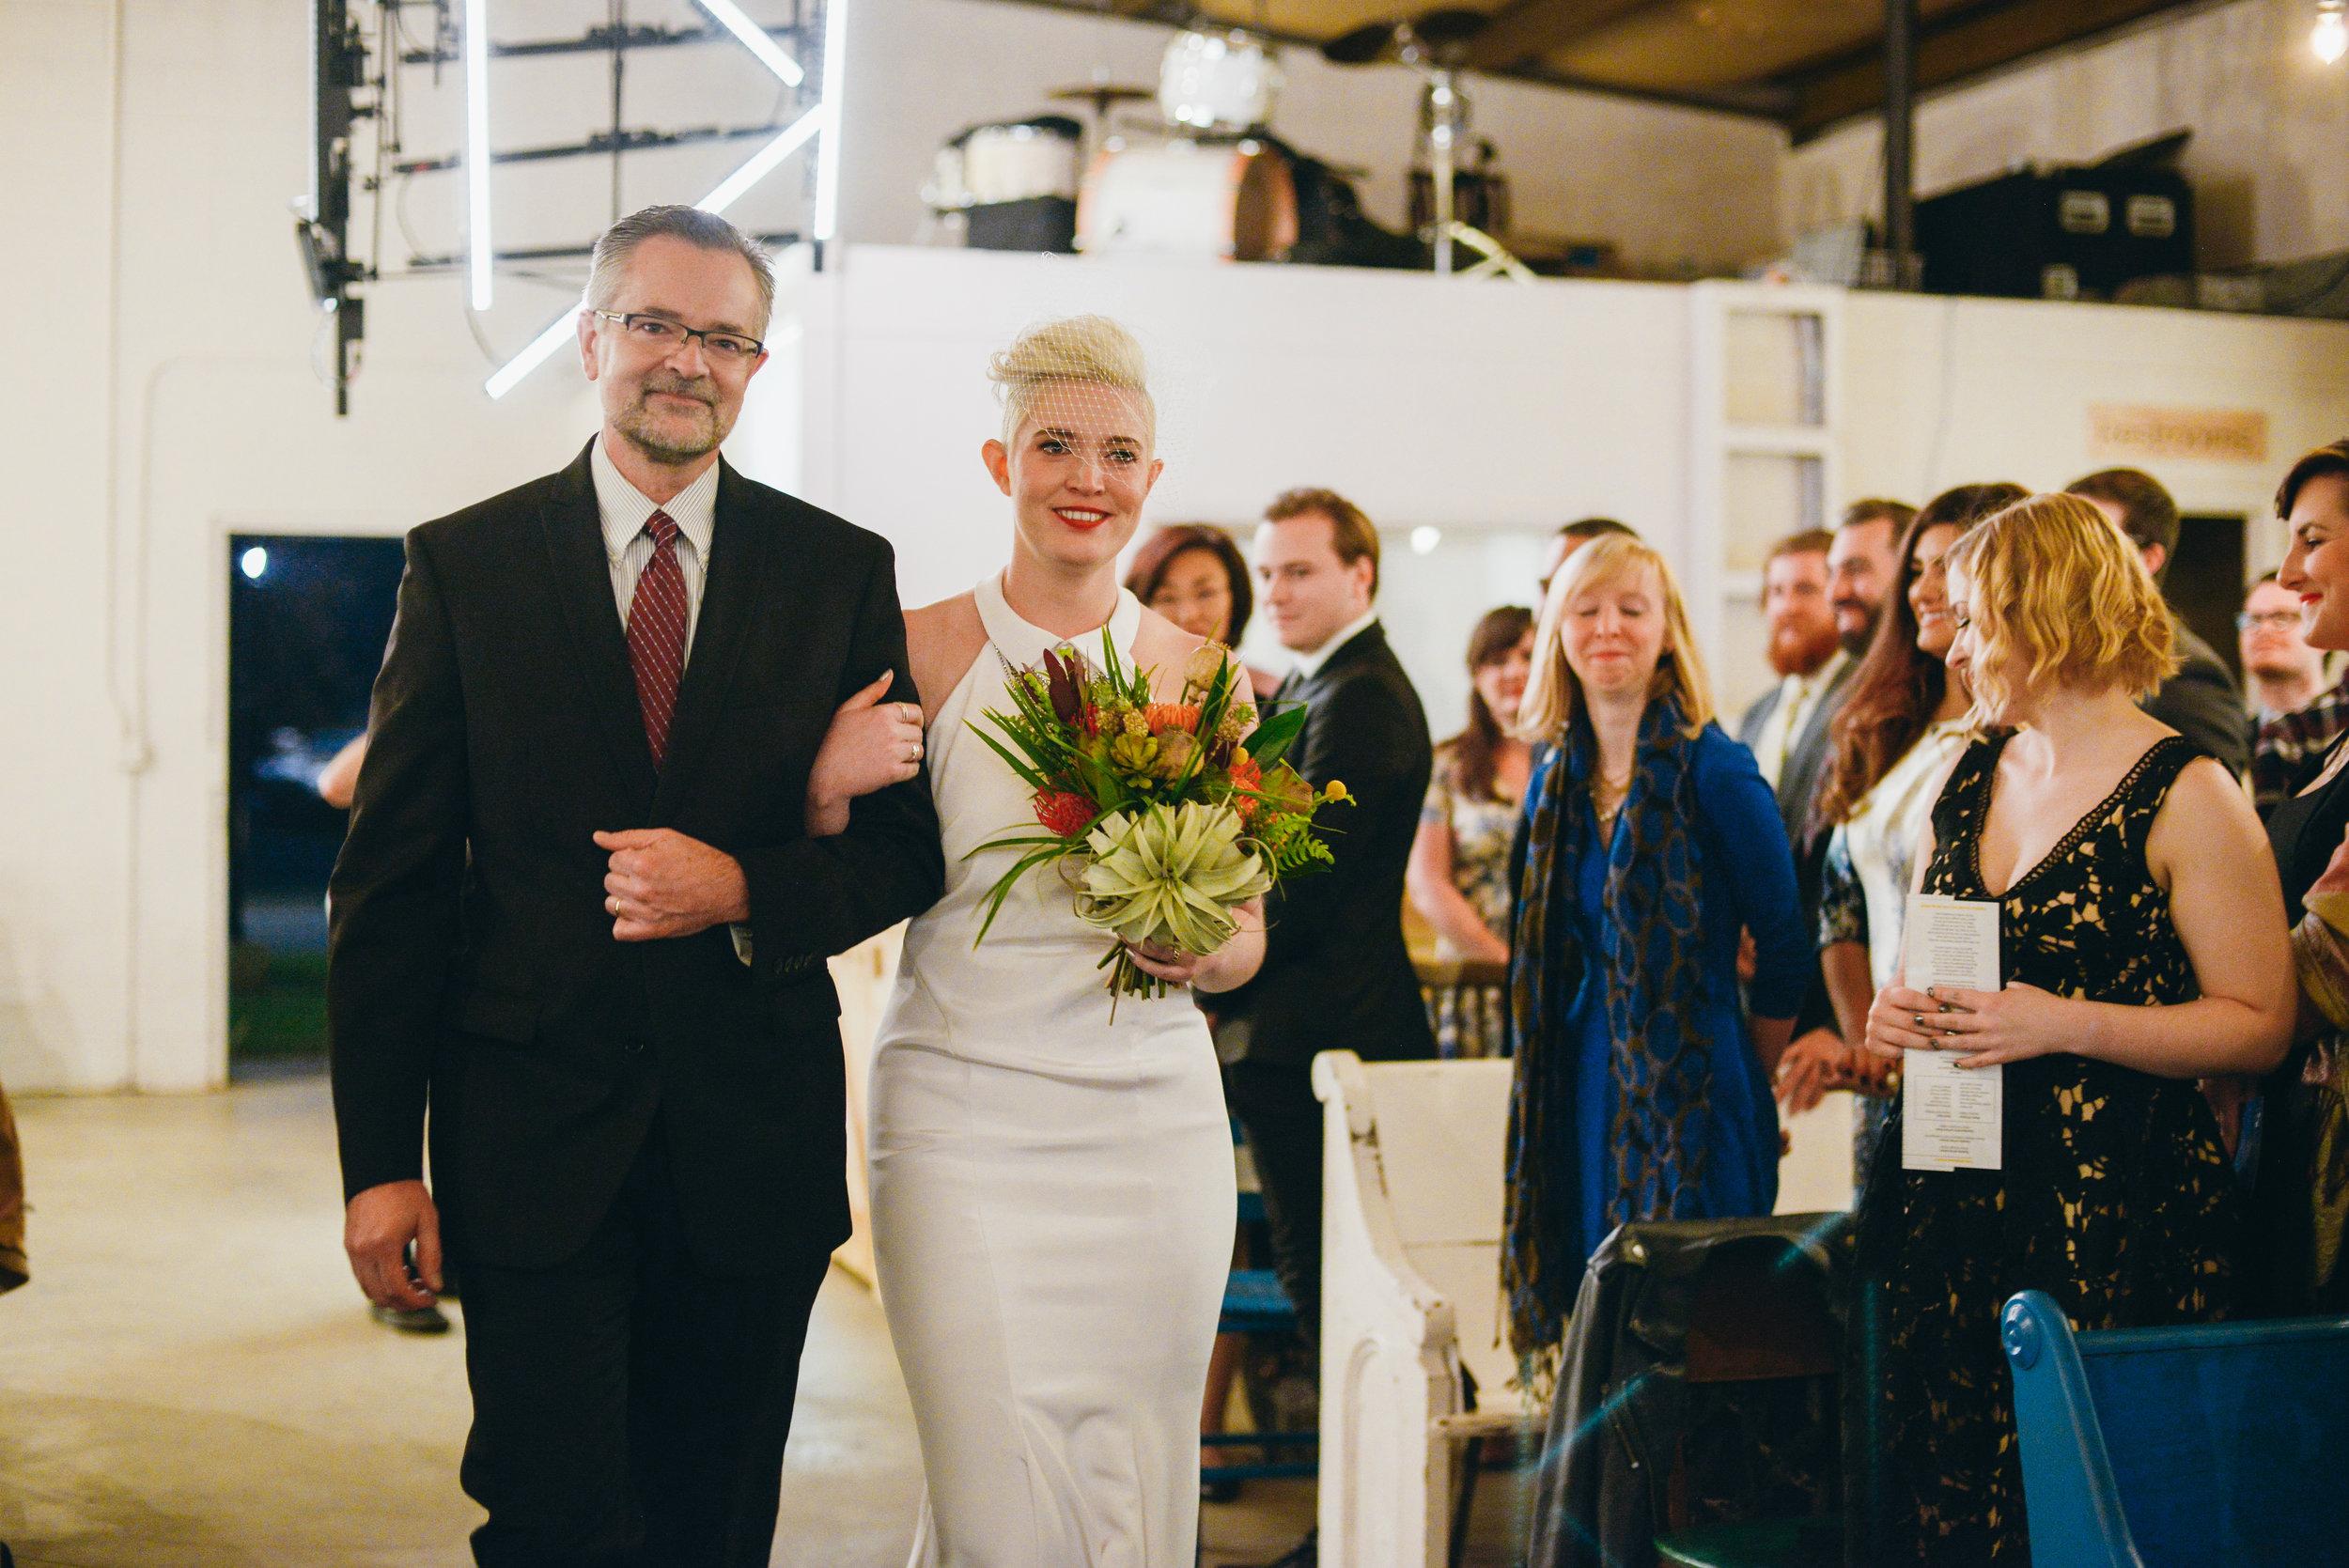 julia-hembree-photography-eden-village-church-wedding-savannah-warehouse-wedding-ivory-and-beau-bridal-boutique-savannah-florist-savannah-wedding-planner-savannah-event-design-scad-wedding-artist-wedding-savannah-funky-wedding-handmade-wedding-51.jpg